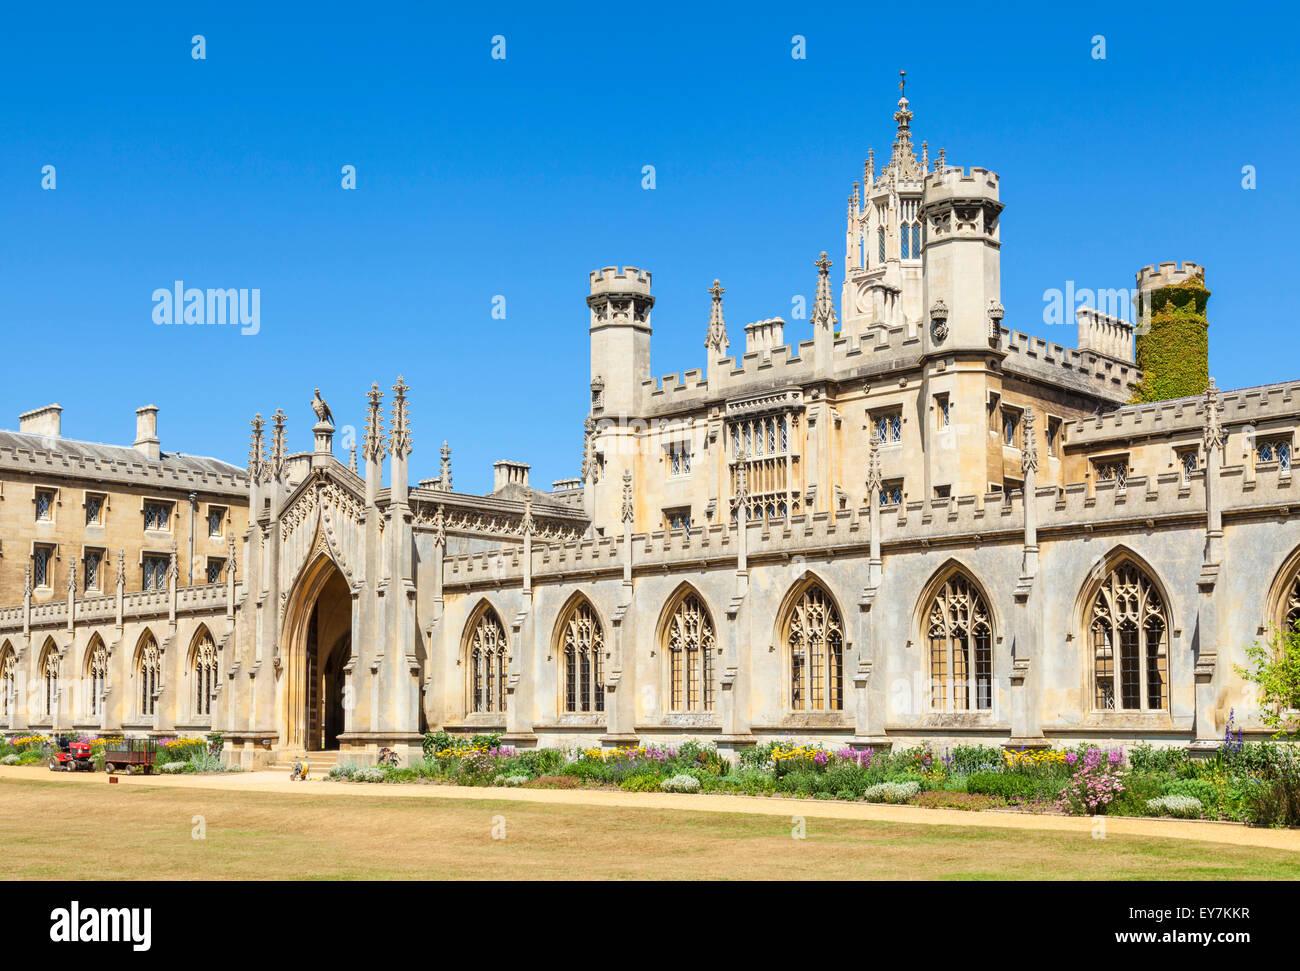 New Court St Johns College Cambridge university Cambridge Cambridgeshire England UK GB EU Europe - Stock Image